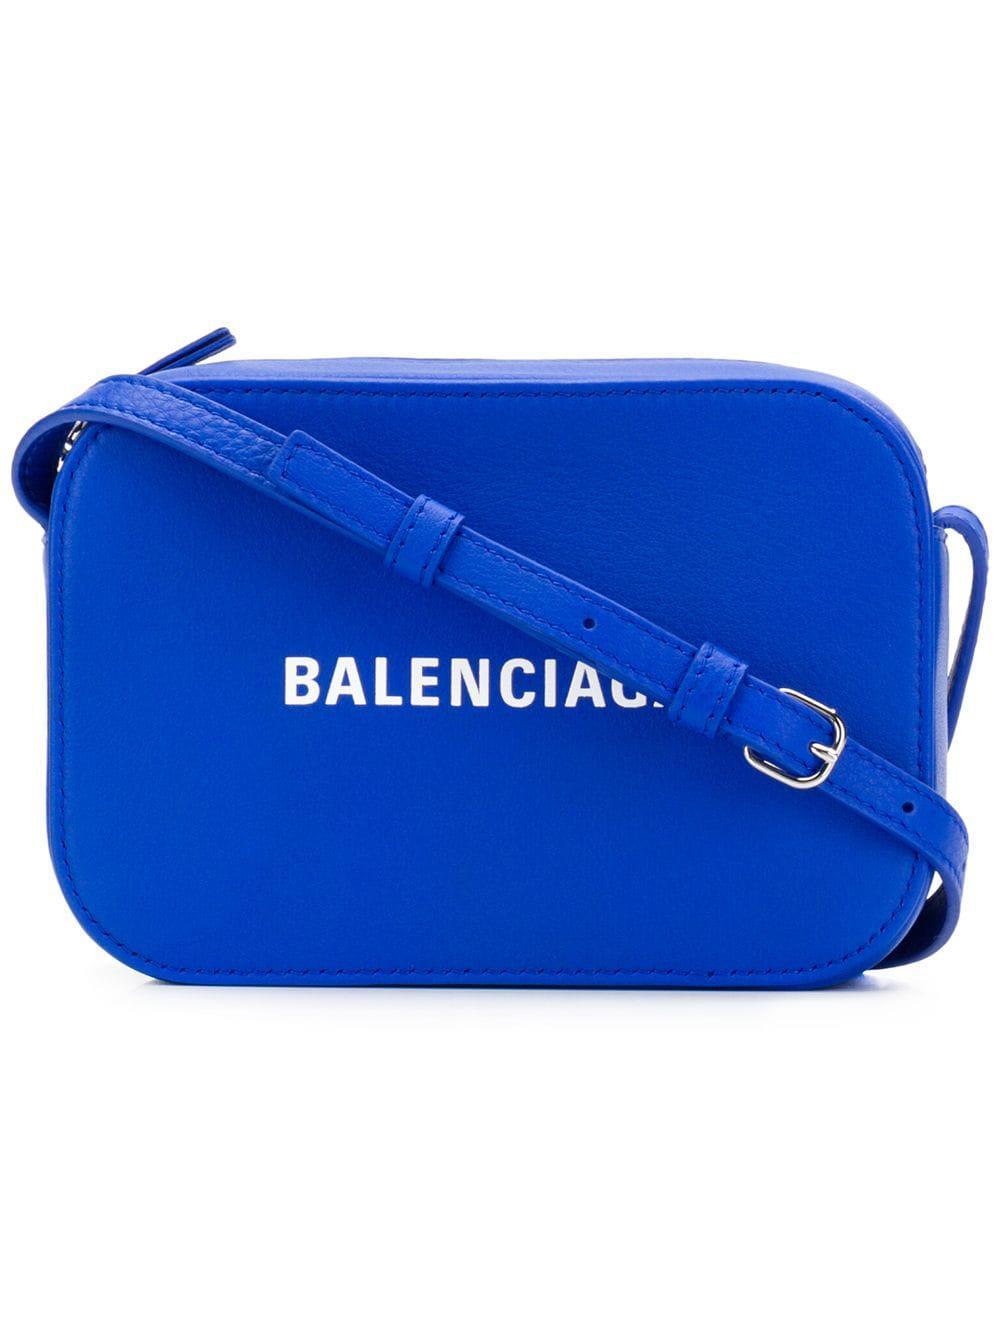 1b728f04e73c Lyst - Balenciaga Everyday Xs Leather Camera Bag in Blue - Save 10%